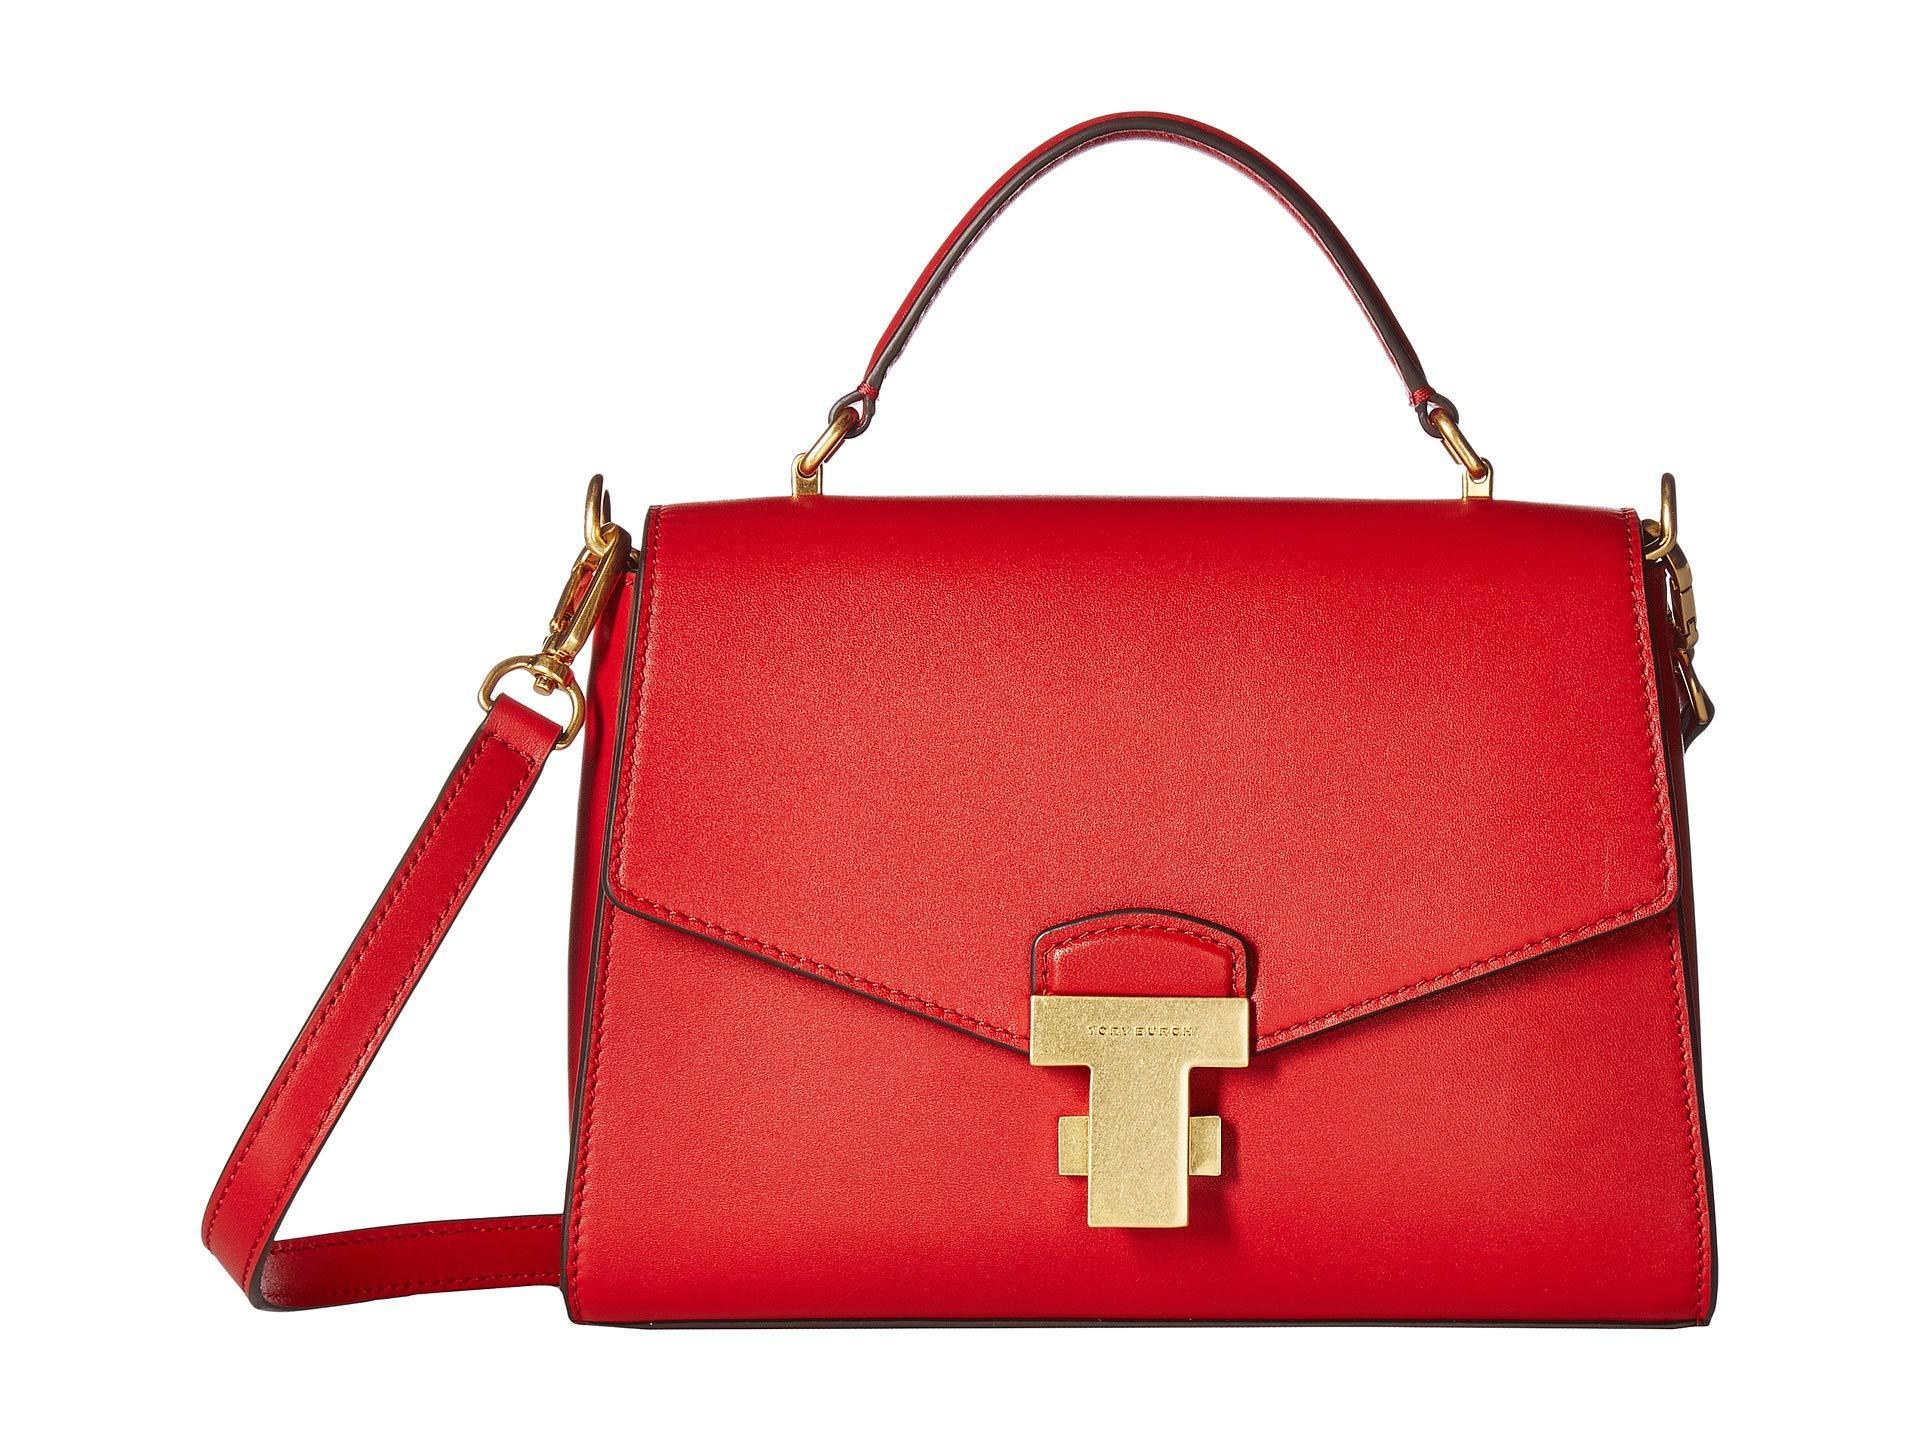 1b78faaeb7f2 Lyst - Tory Burch Juliette Small Top-handle Satchel (ruby Red ...